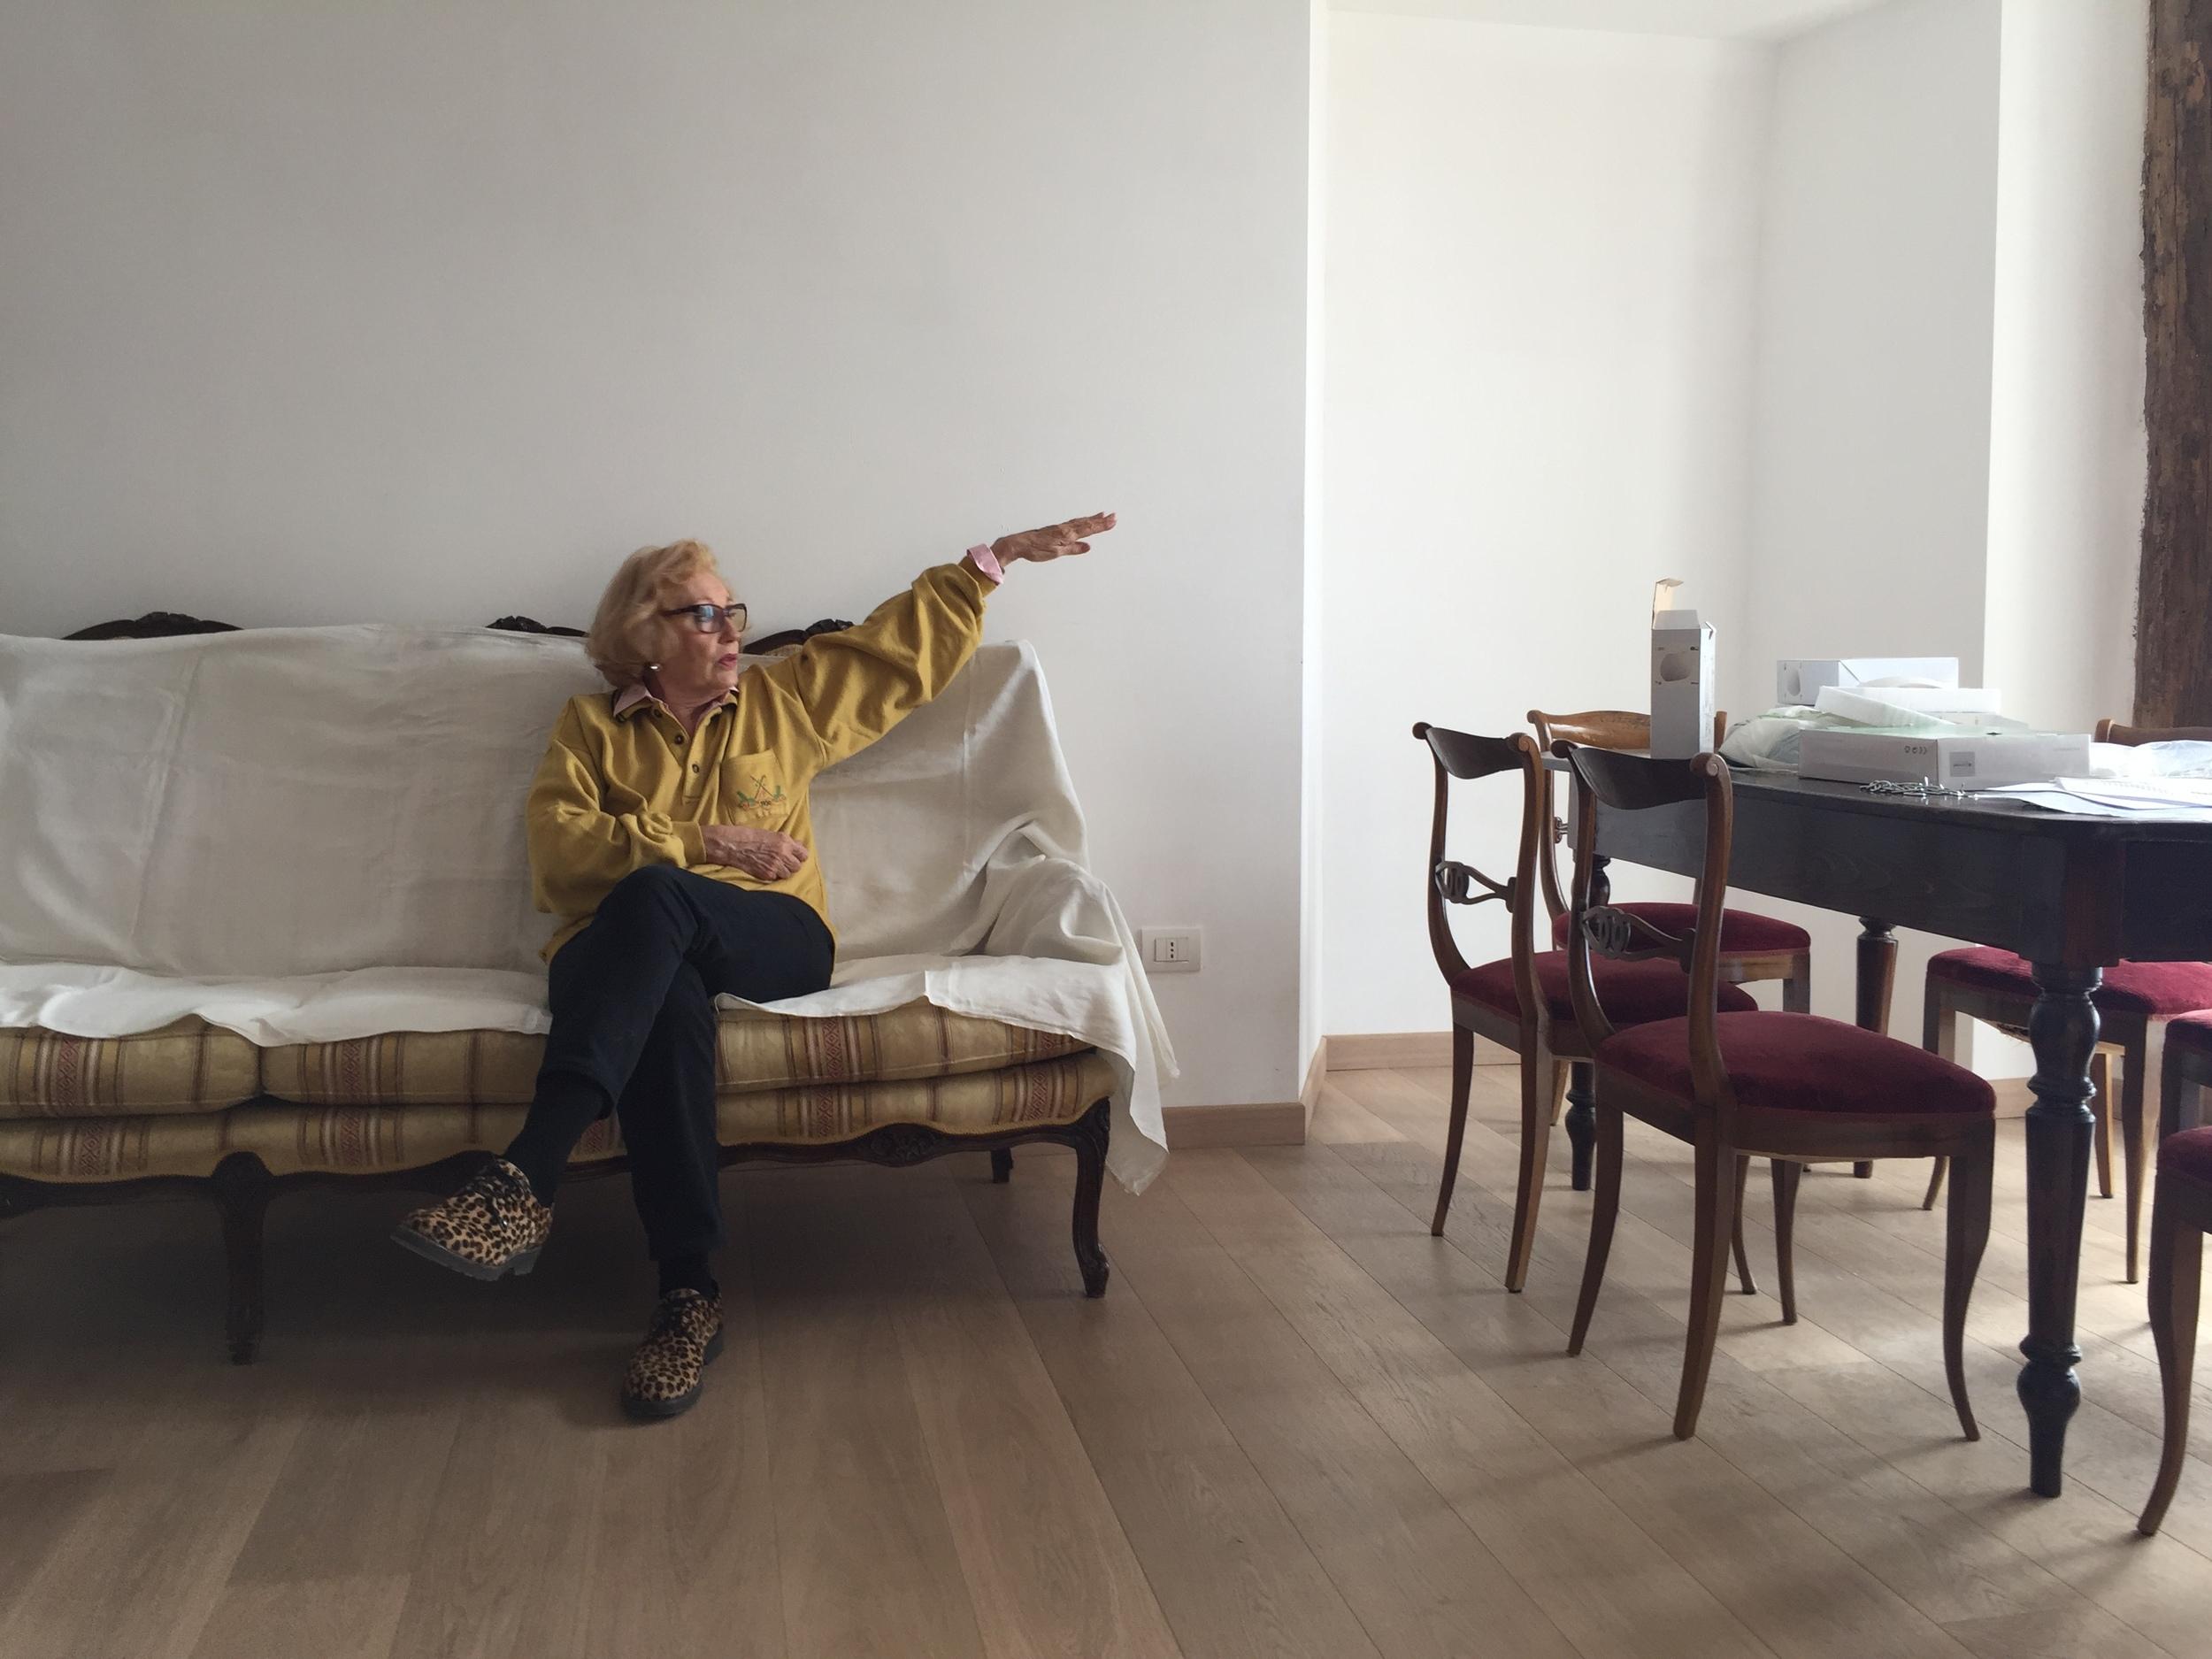 short break to discuss Furniture arrangement